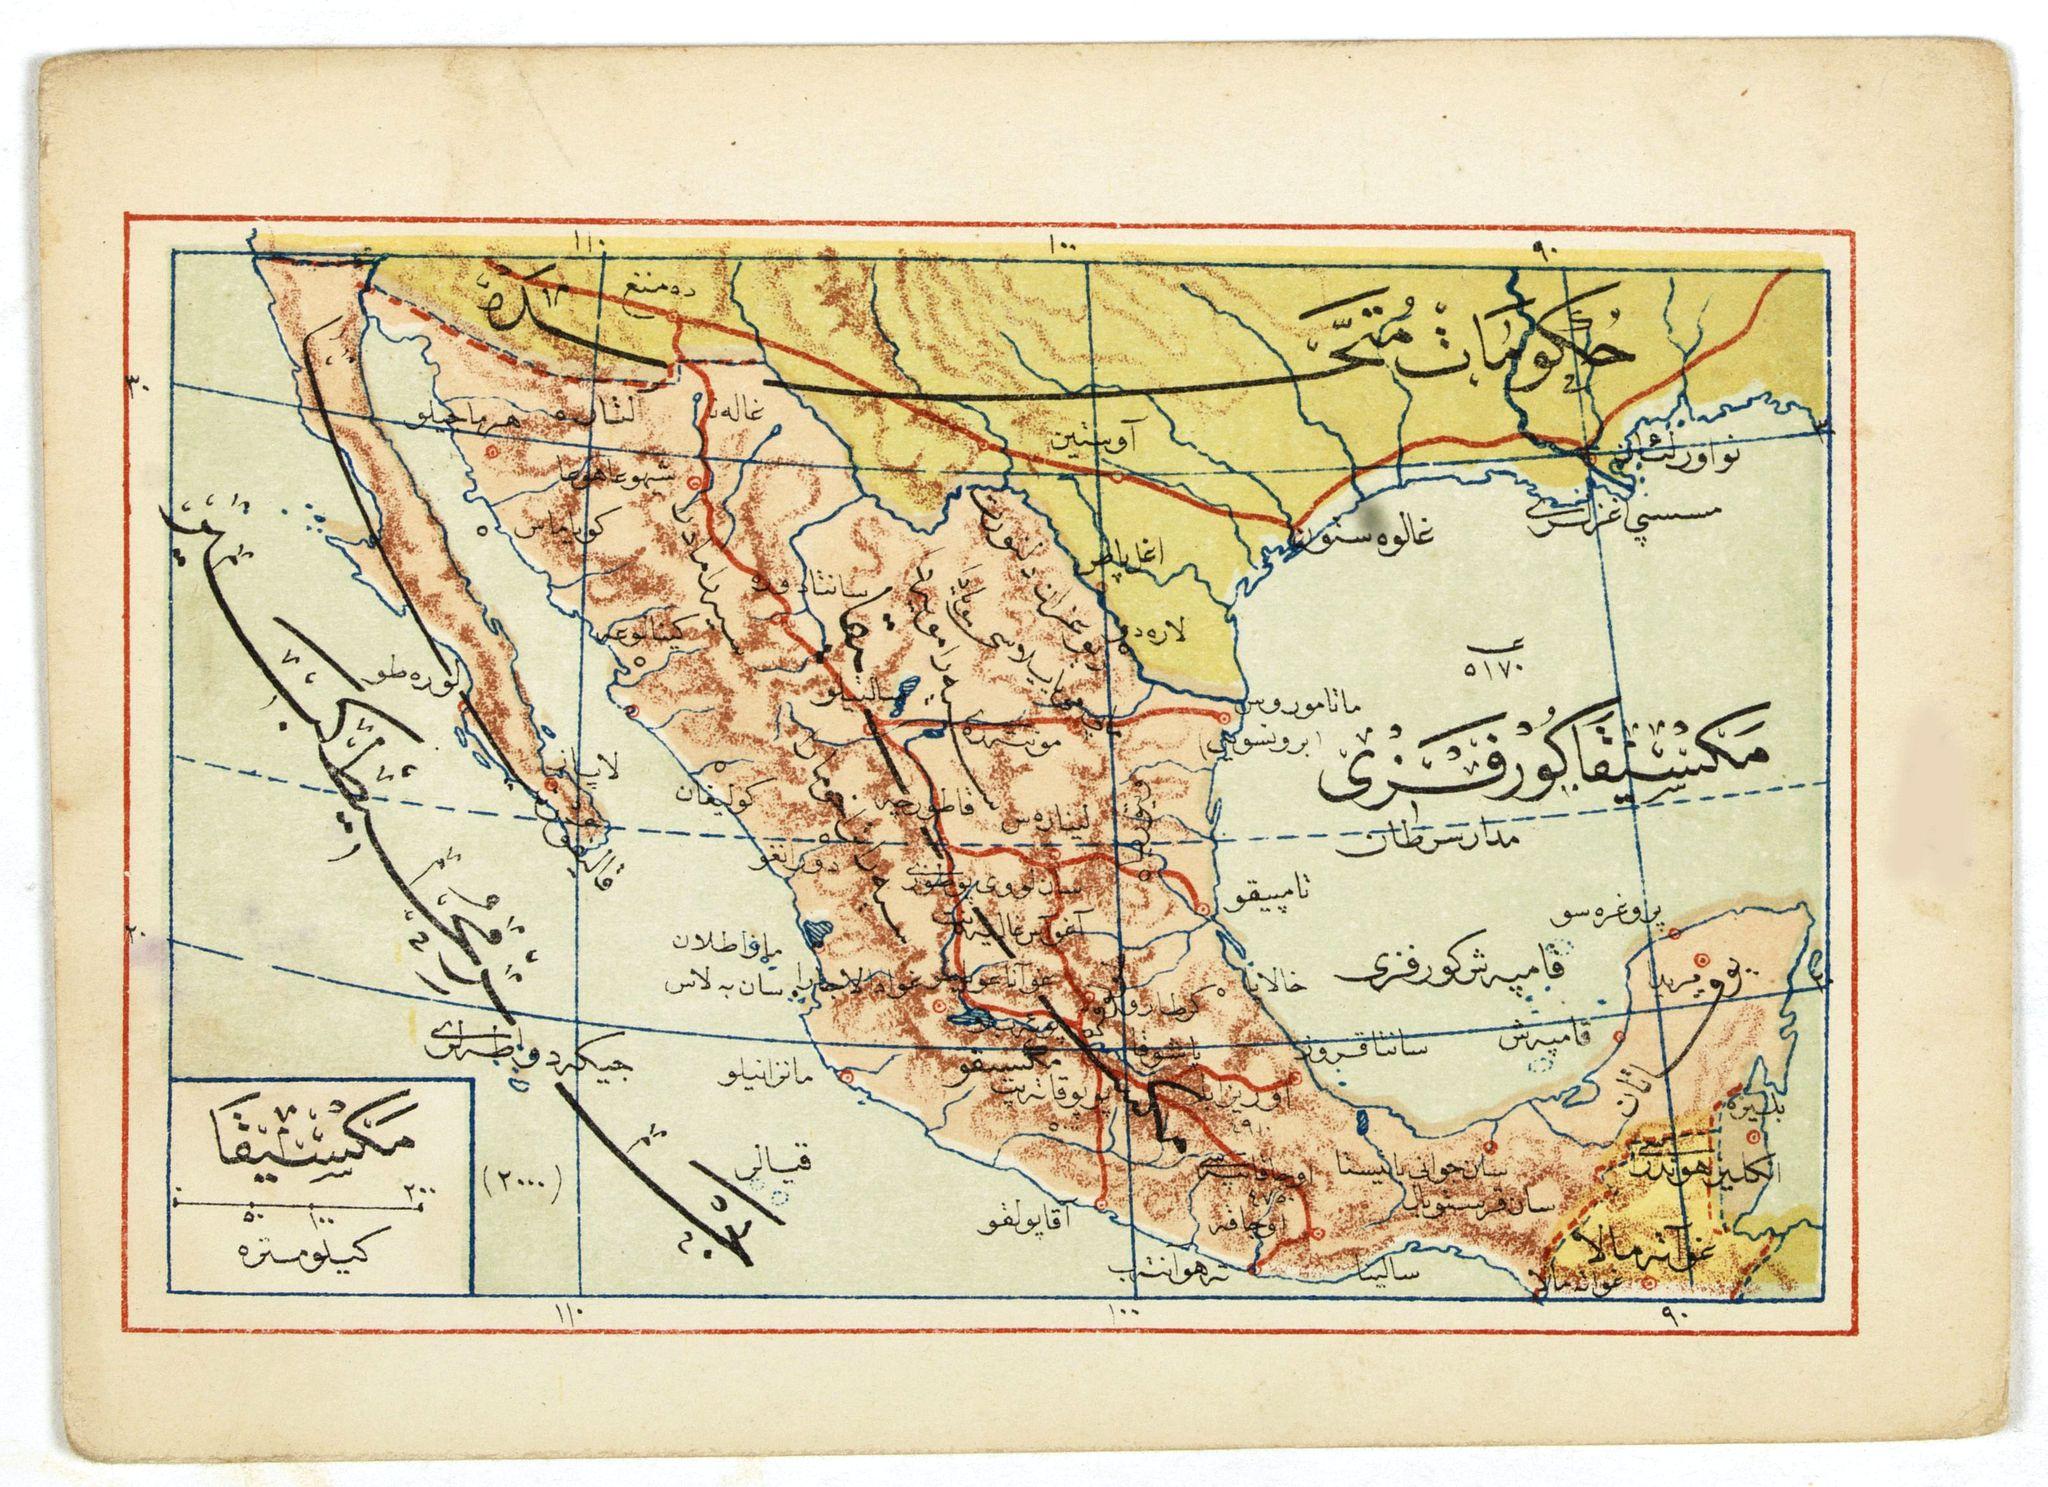 EŞREF, Mehmet -  [Mexico map with Ottoman script]